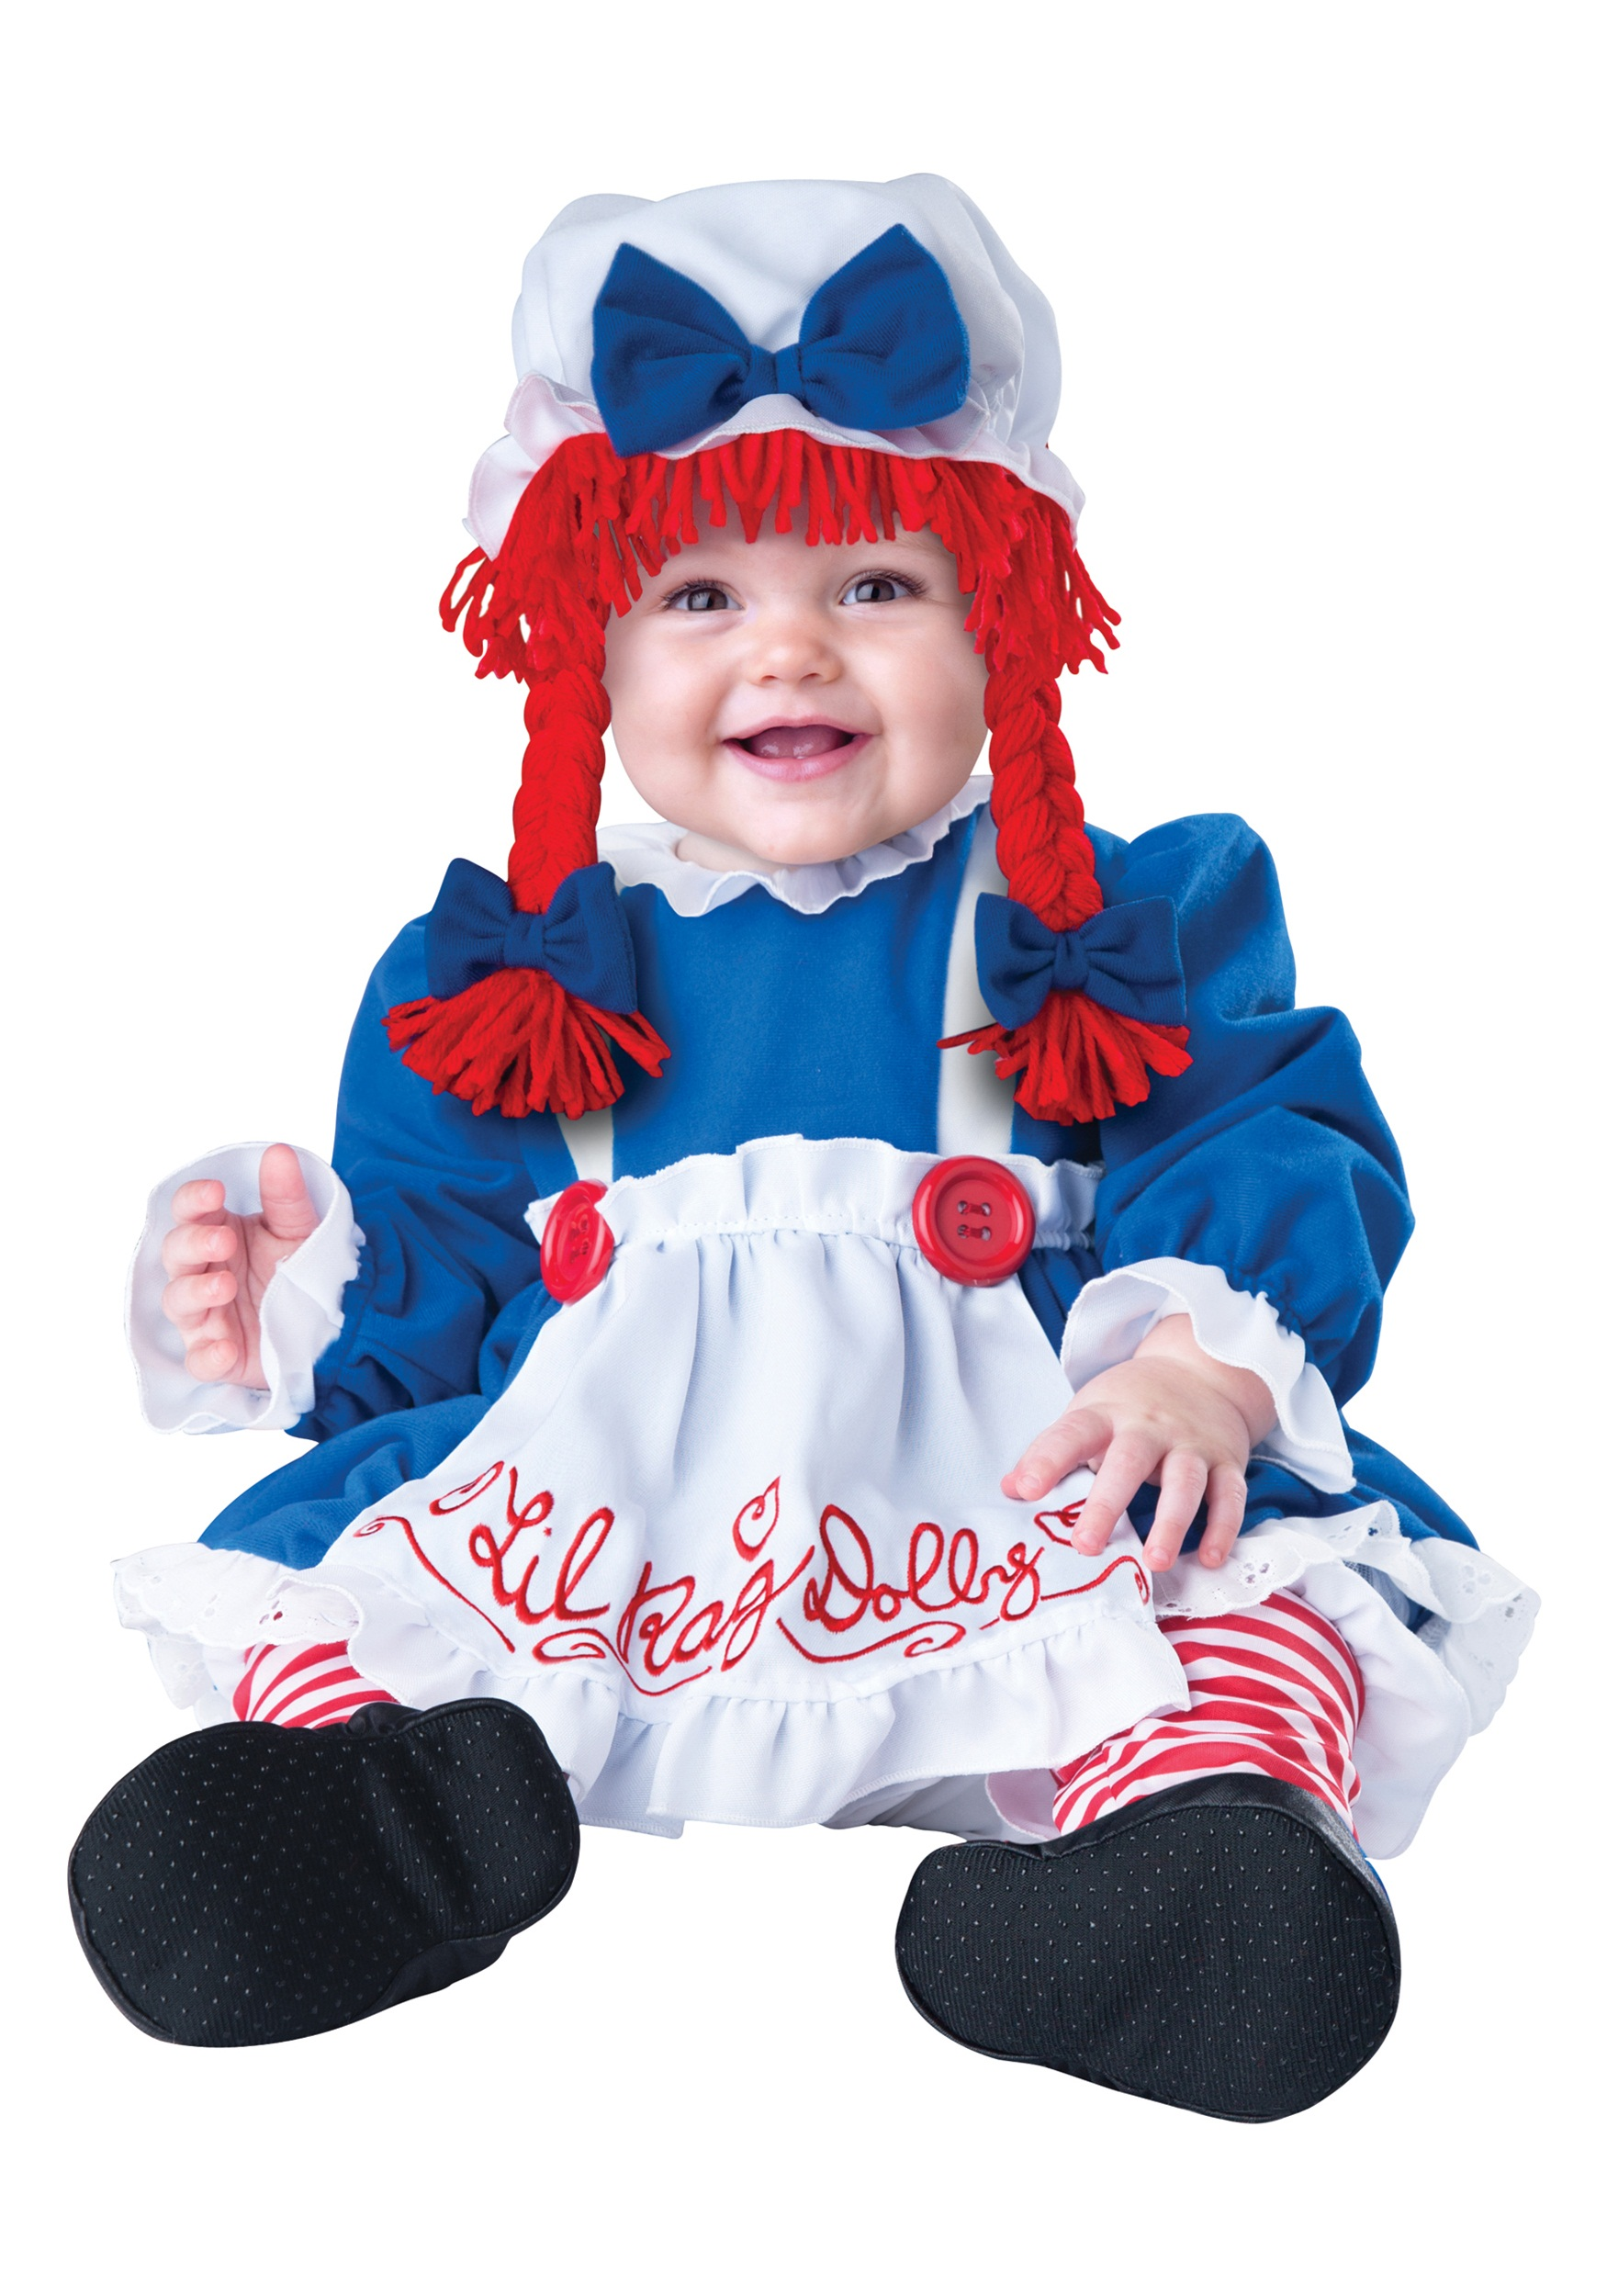 Infant Liu0027l Rag Doll Costume  sc 1 st  Halloween Costumes & Infant Liu0027l Rag Doll Costume - Halloween Costumes